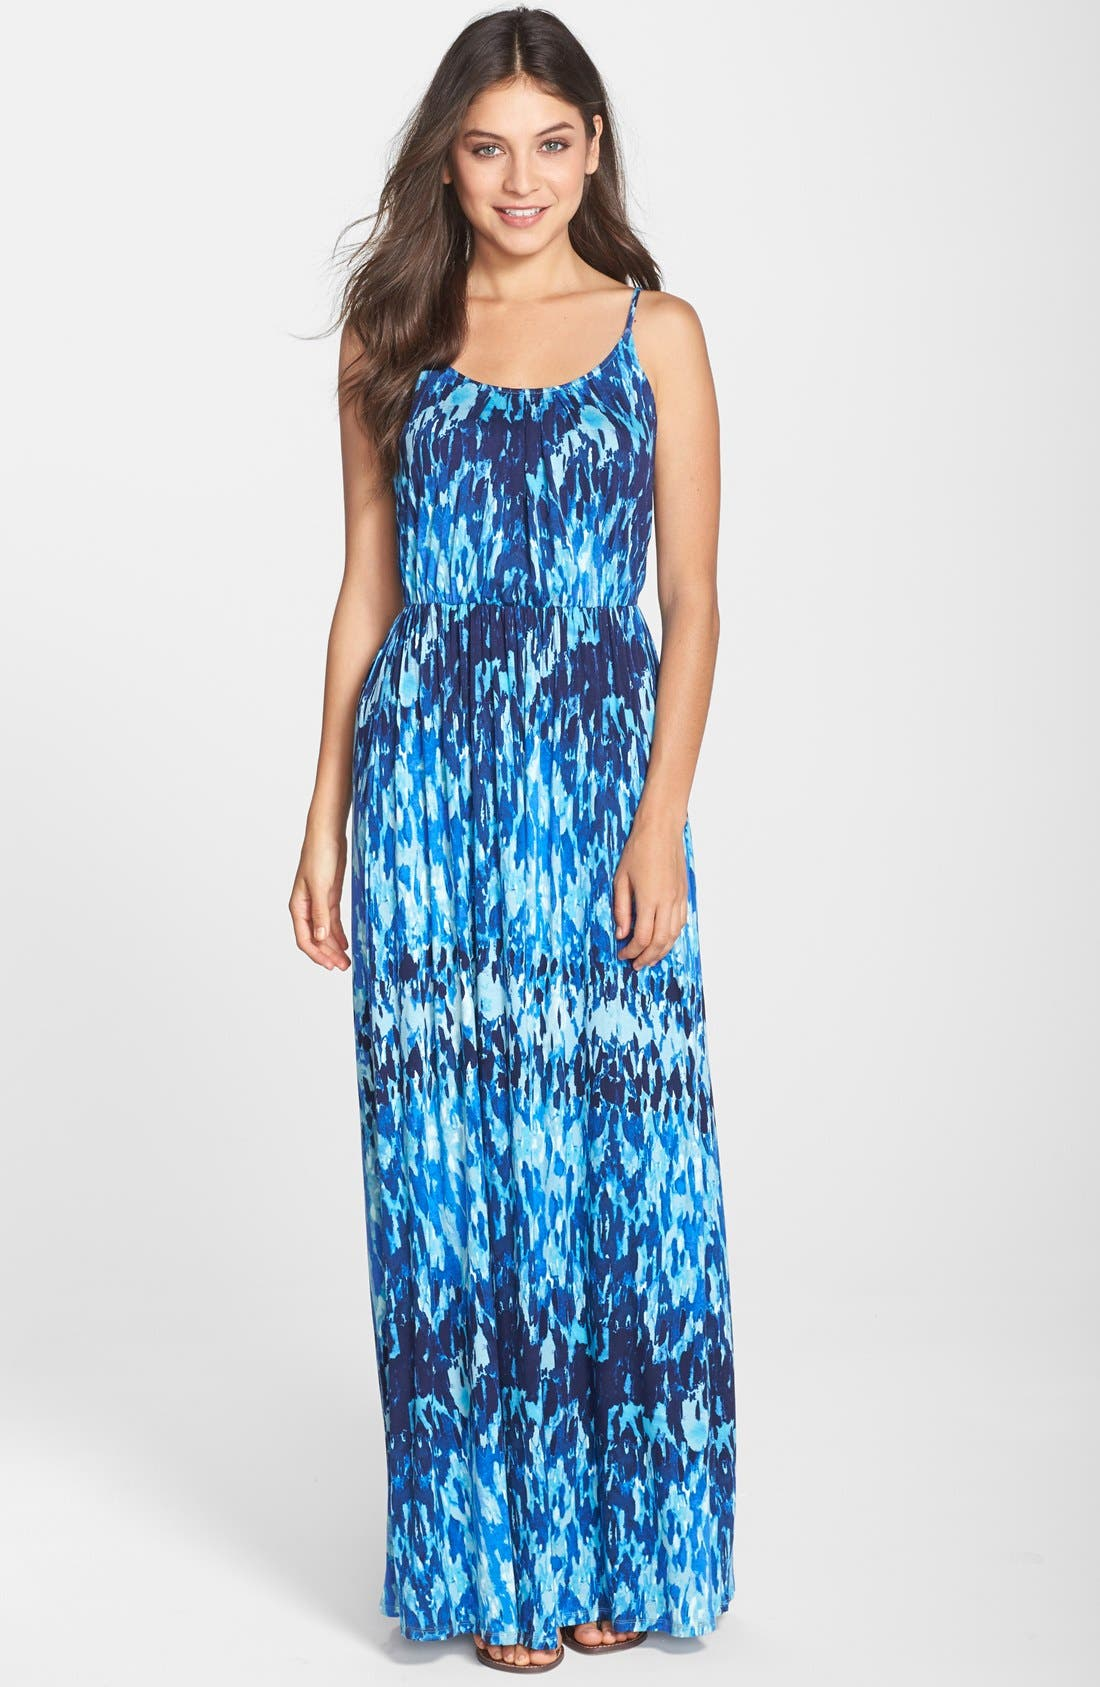 Alternate Image 1 Selected - Felicity & Coco 'Ezri' Print Maxi Dress (Regular & Petite) (Nordstrom Exclusive)